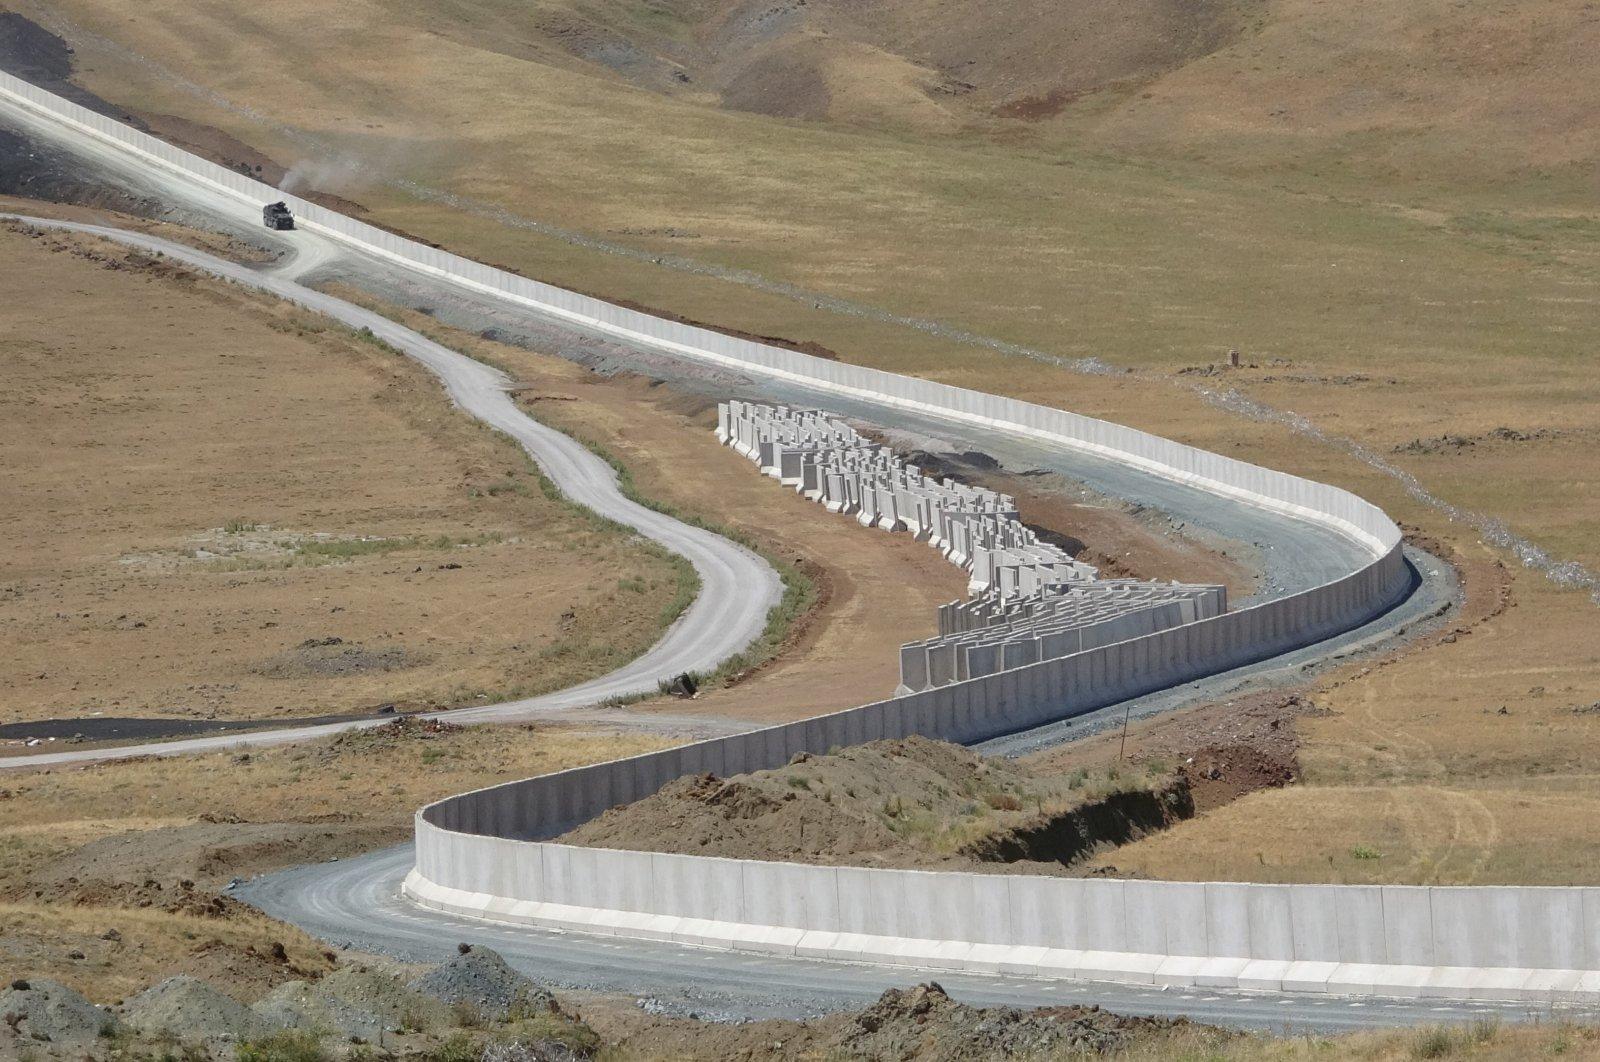 A view from Turkey's eastern border with Iran, Van, Turkey, July 27, 2021. (IHA Photo)